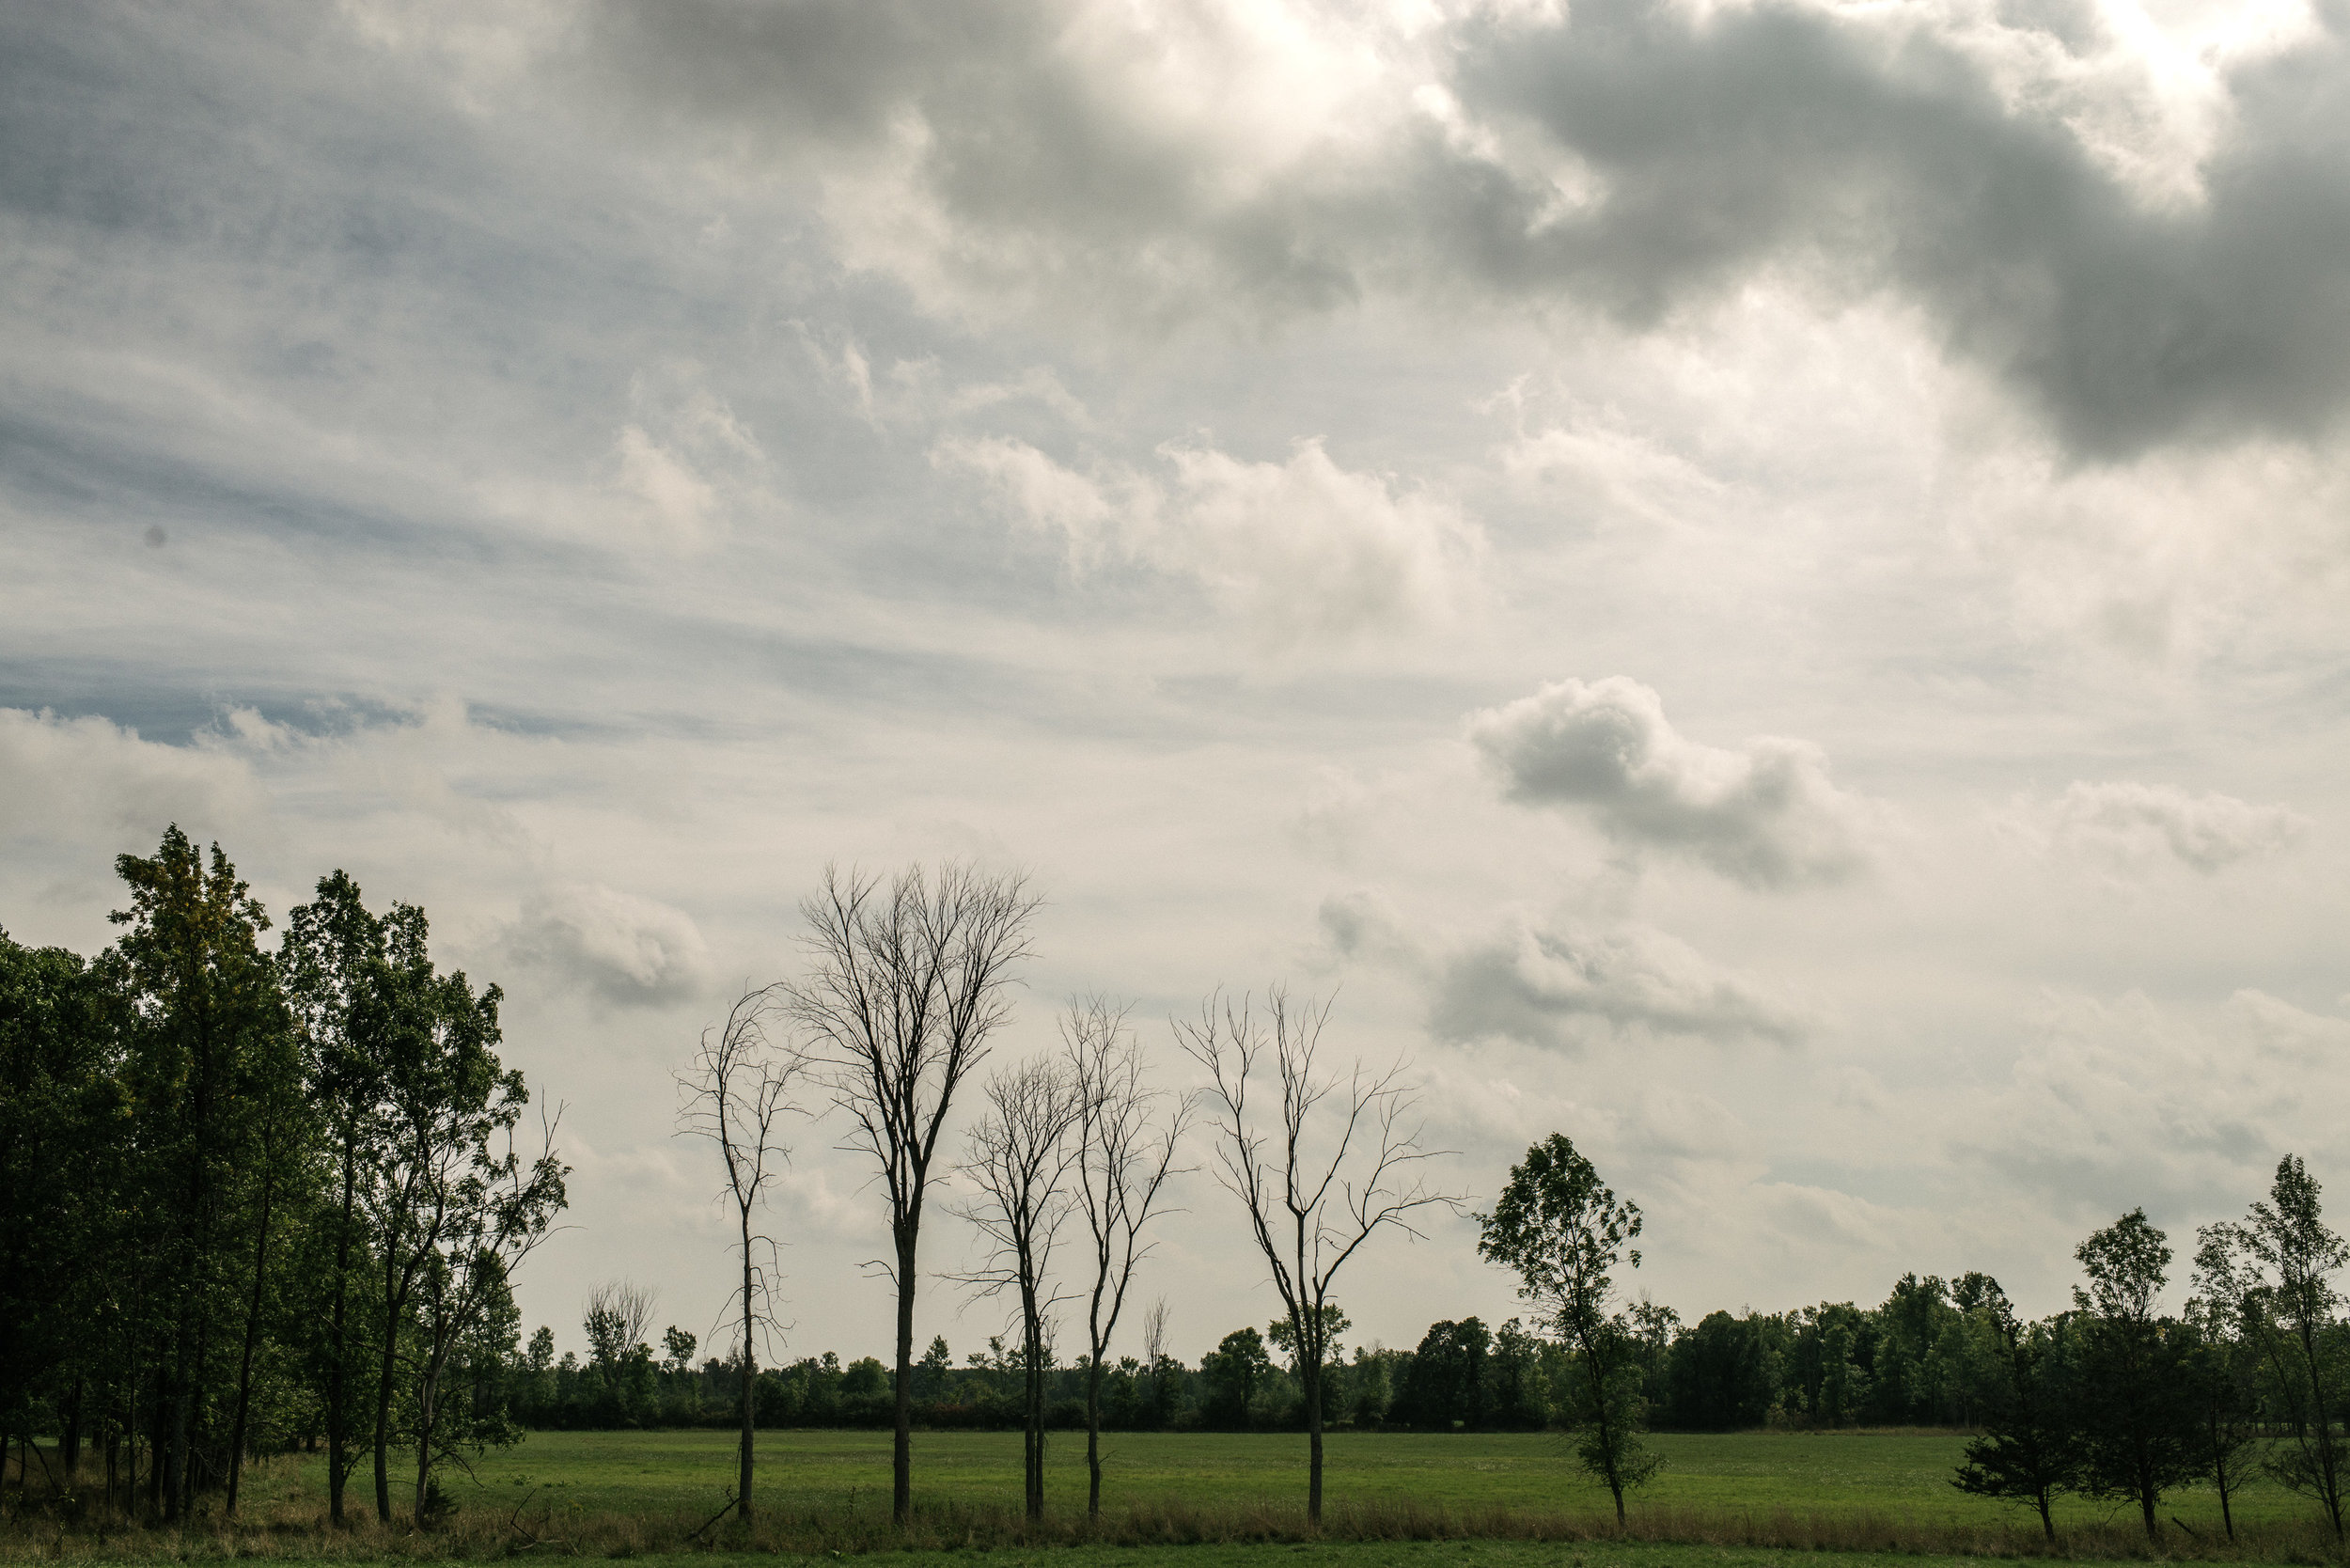 documentary photography viara mileva-142612vm.jpg